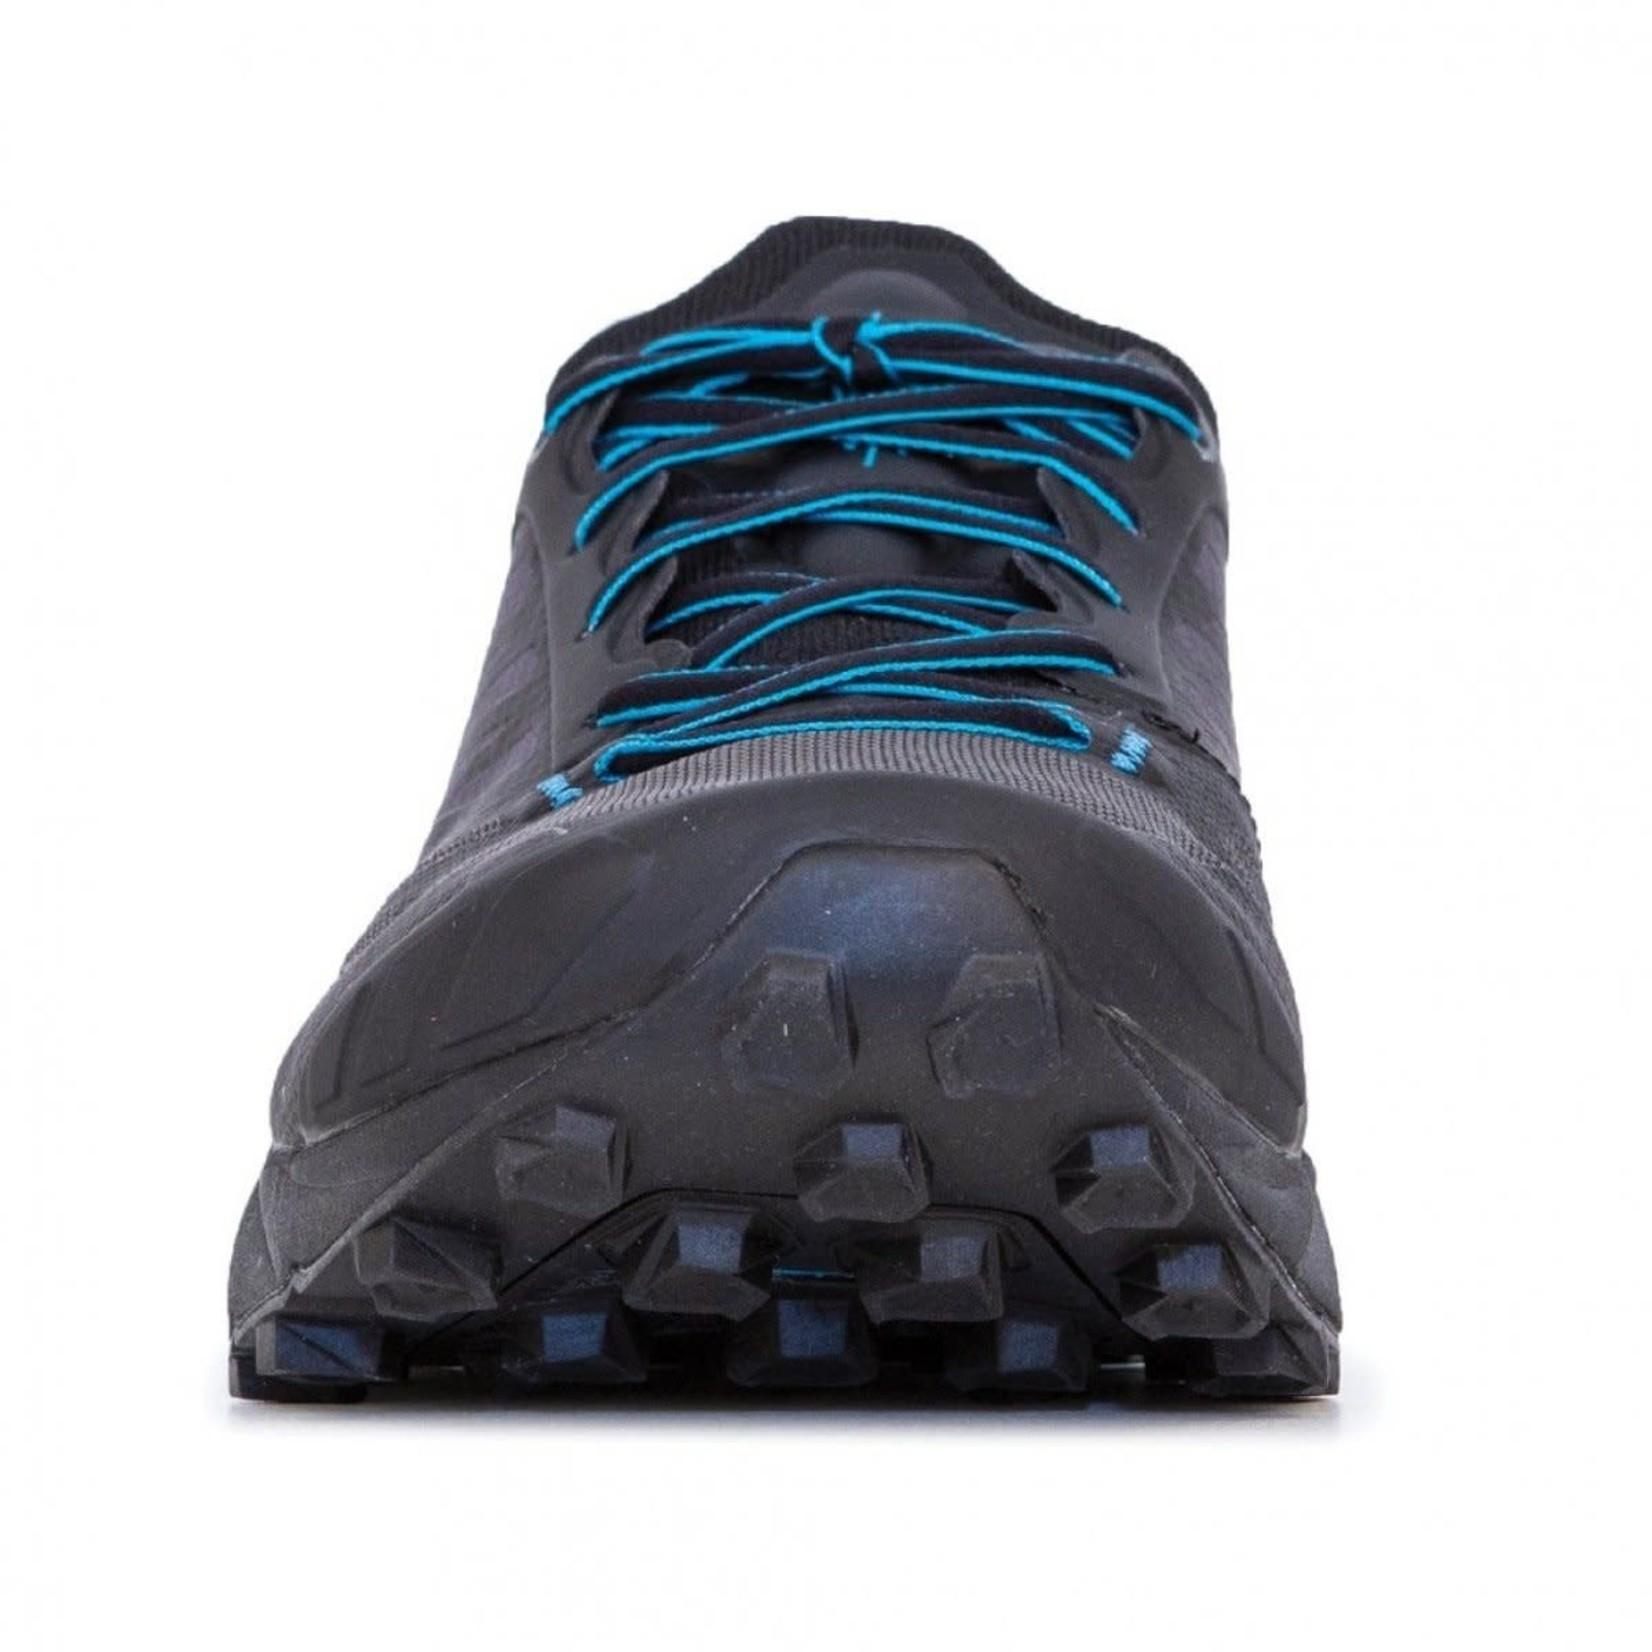 La Sportiva La Sportiva Kaptiva Running Shoes - Men